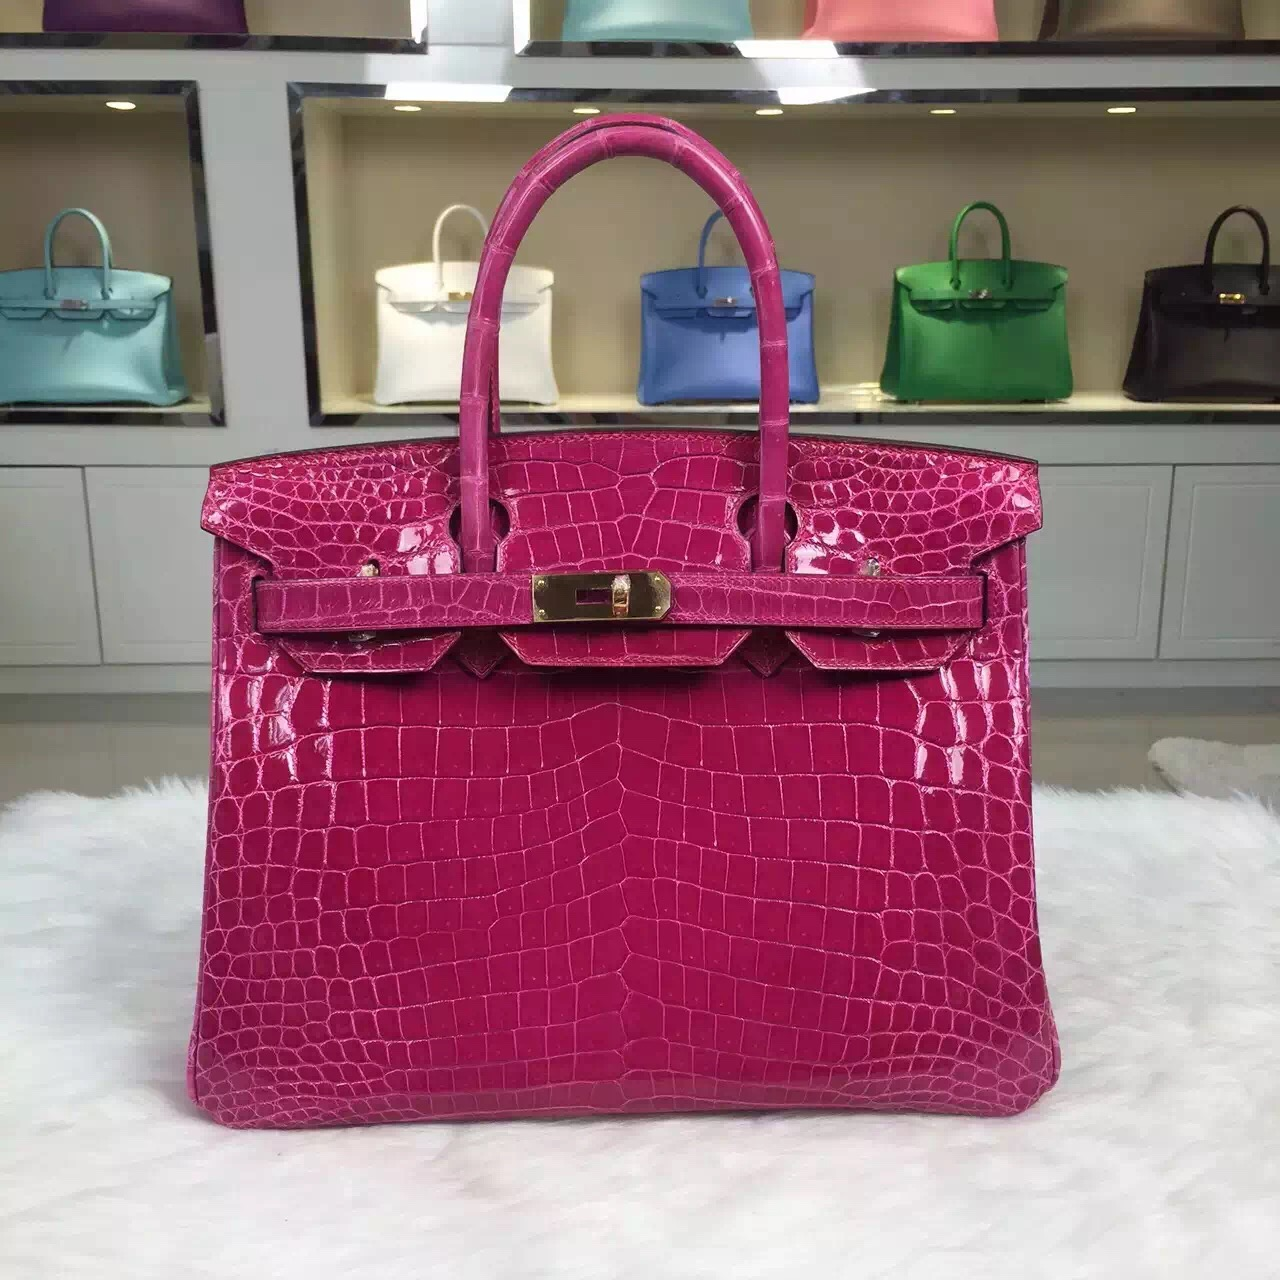 Wholesale Hermes Nicotious Crocodile Skin Birkin Bag 30CM in 5J Hot Pink